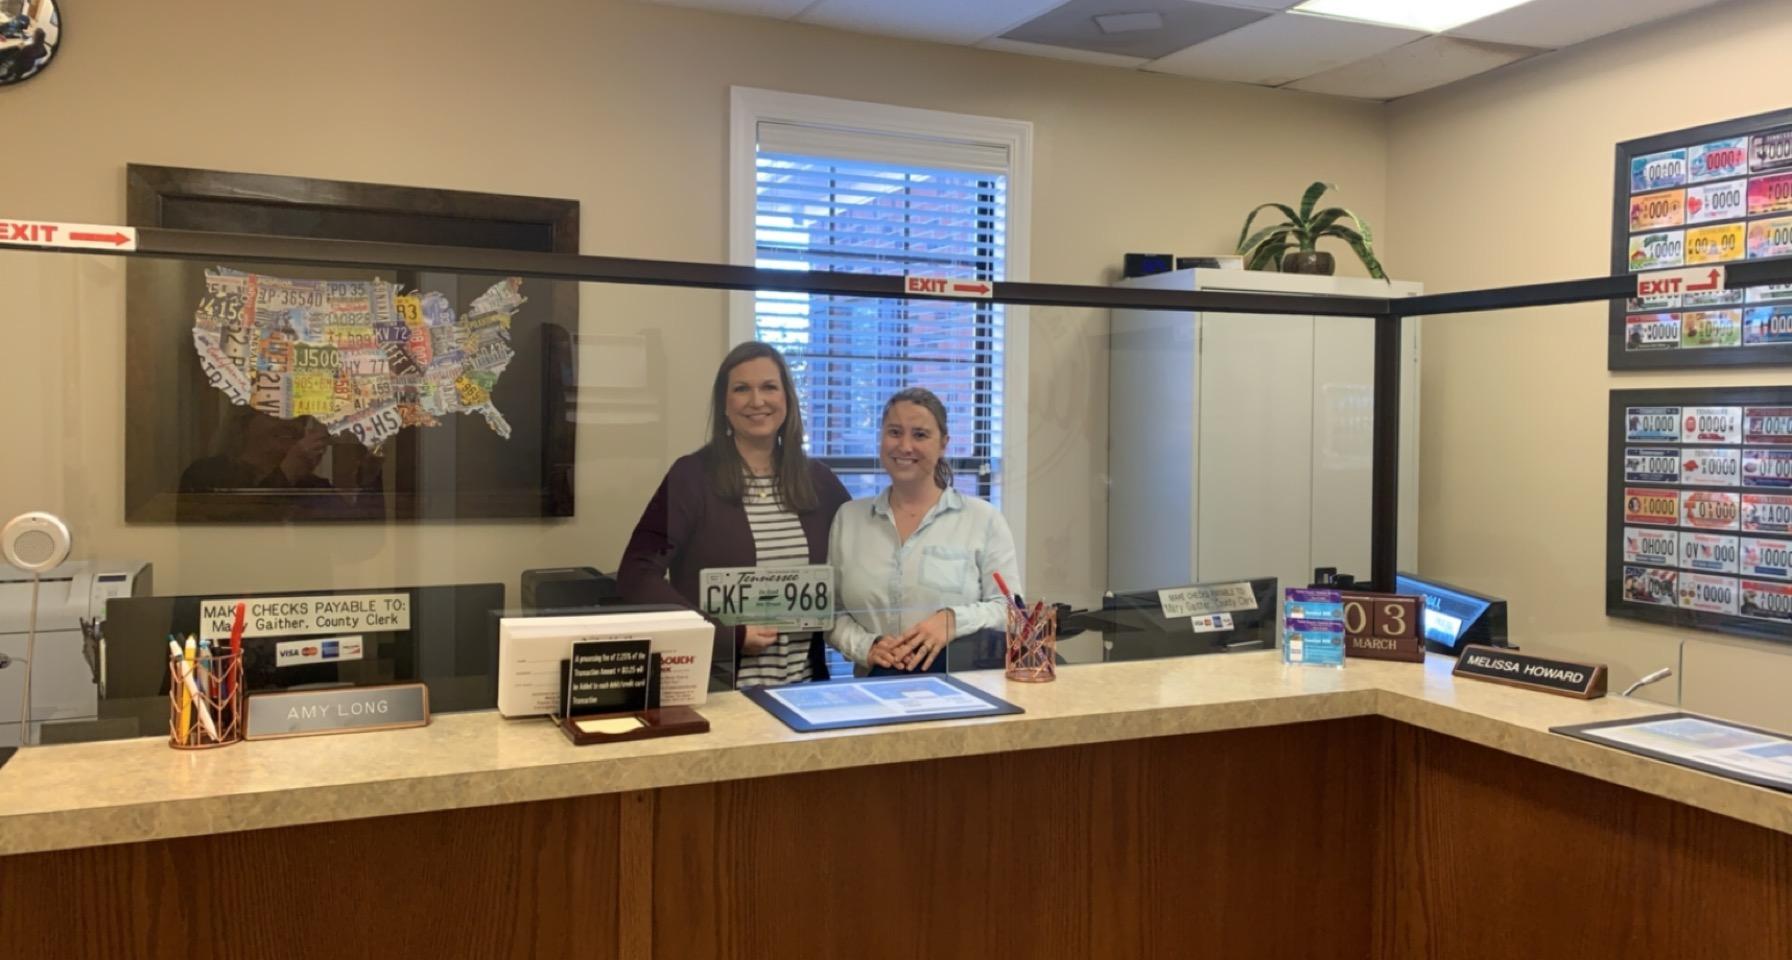 Tipton County Clerk's Office